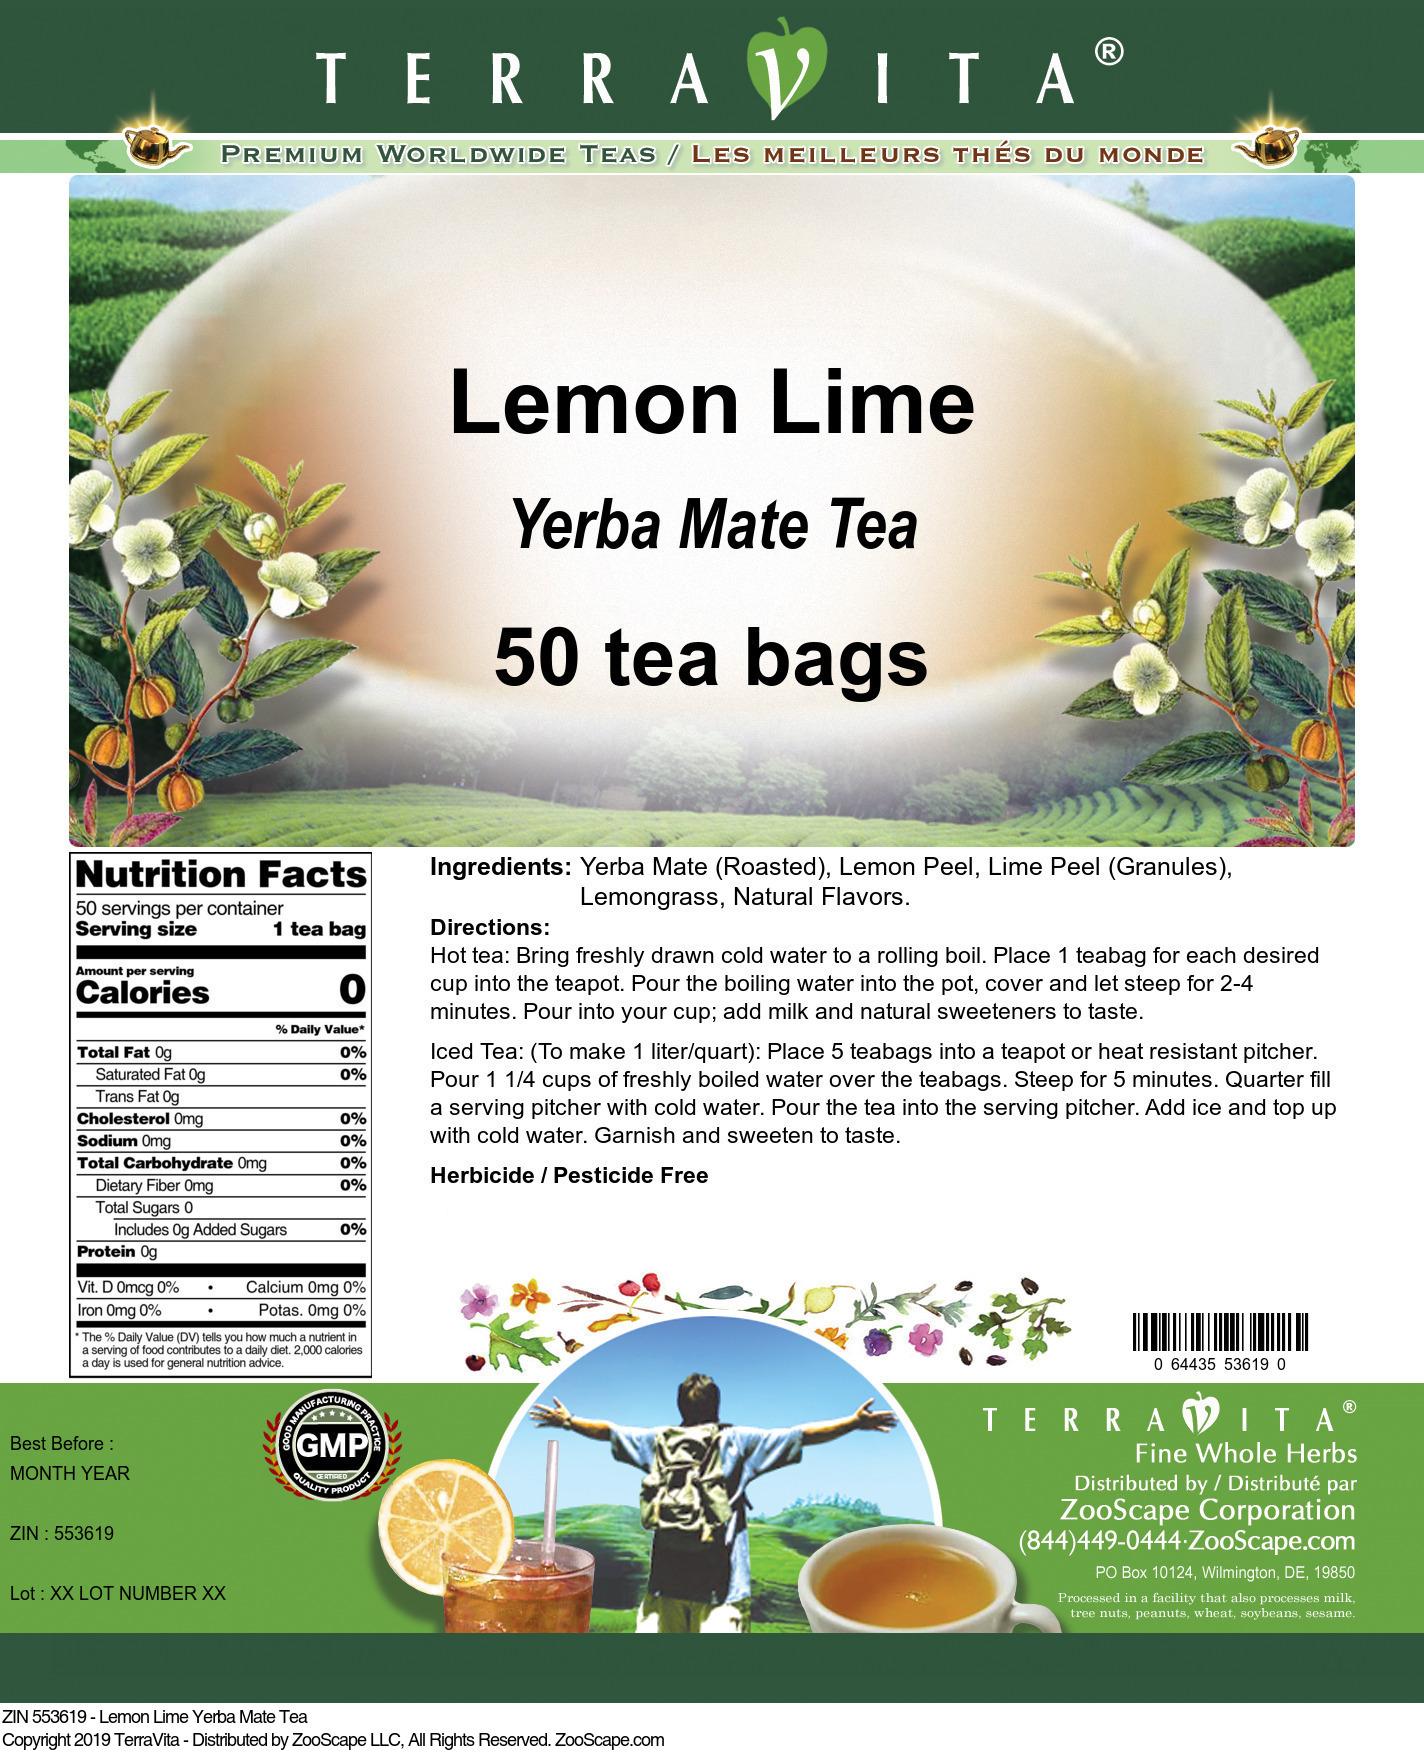 Lemon Lime Yerba Mate